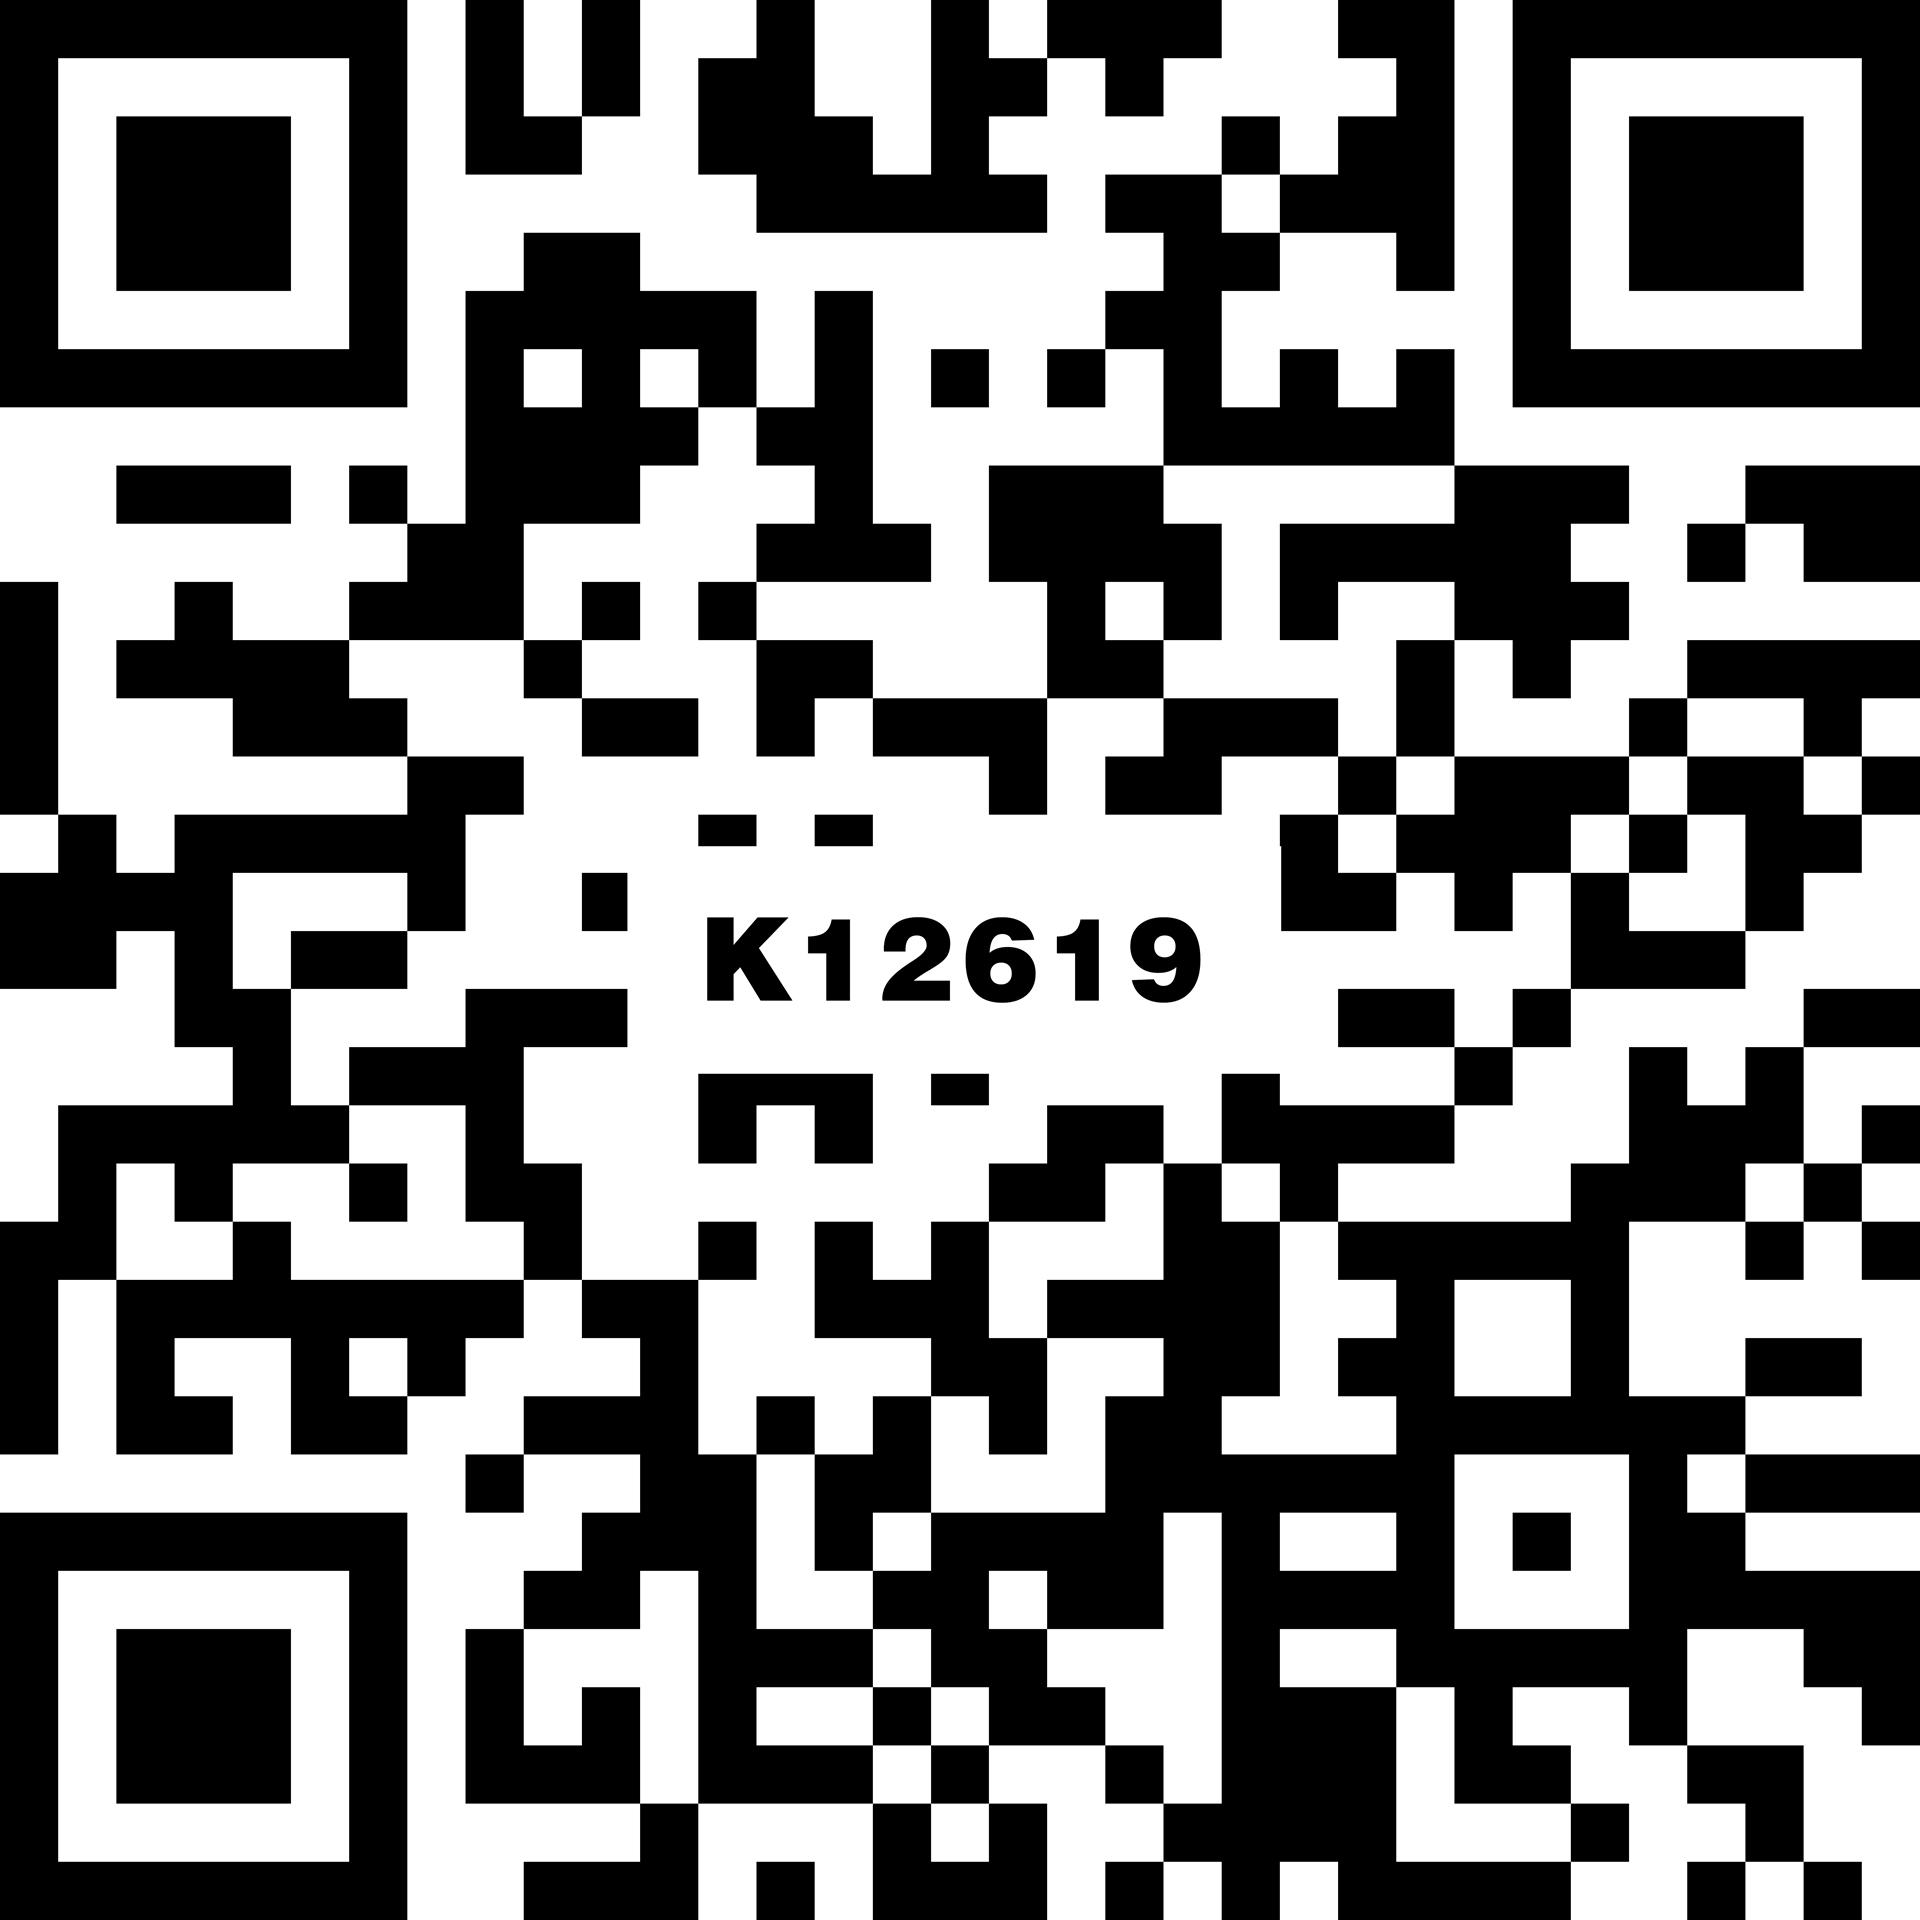 K12619